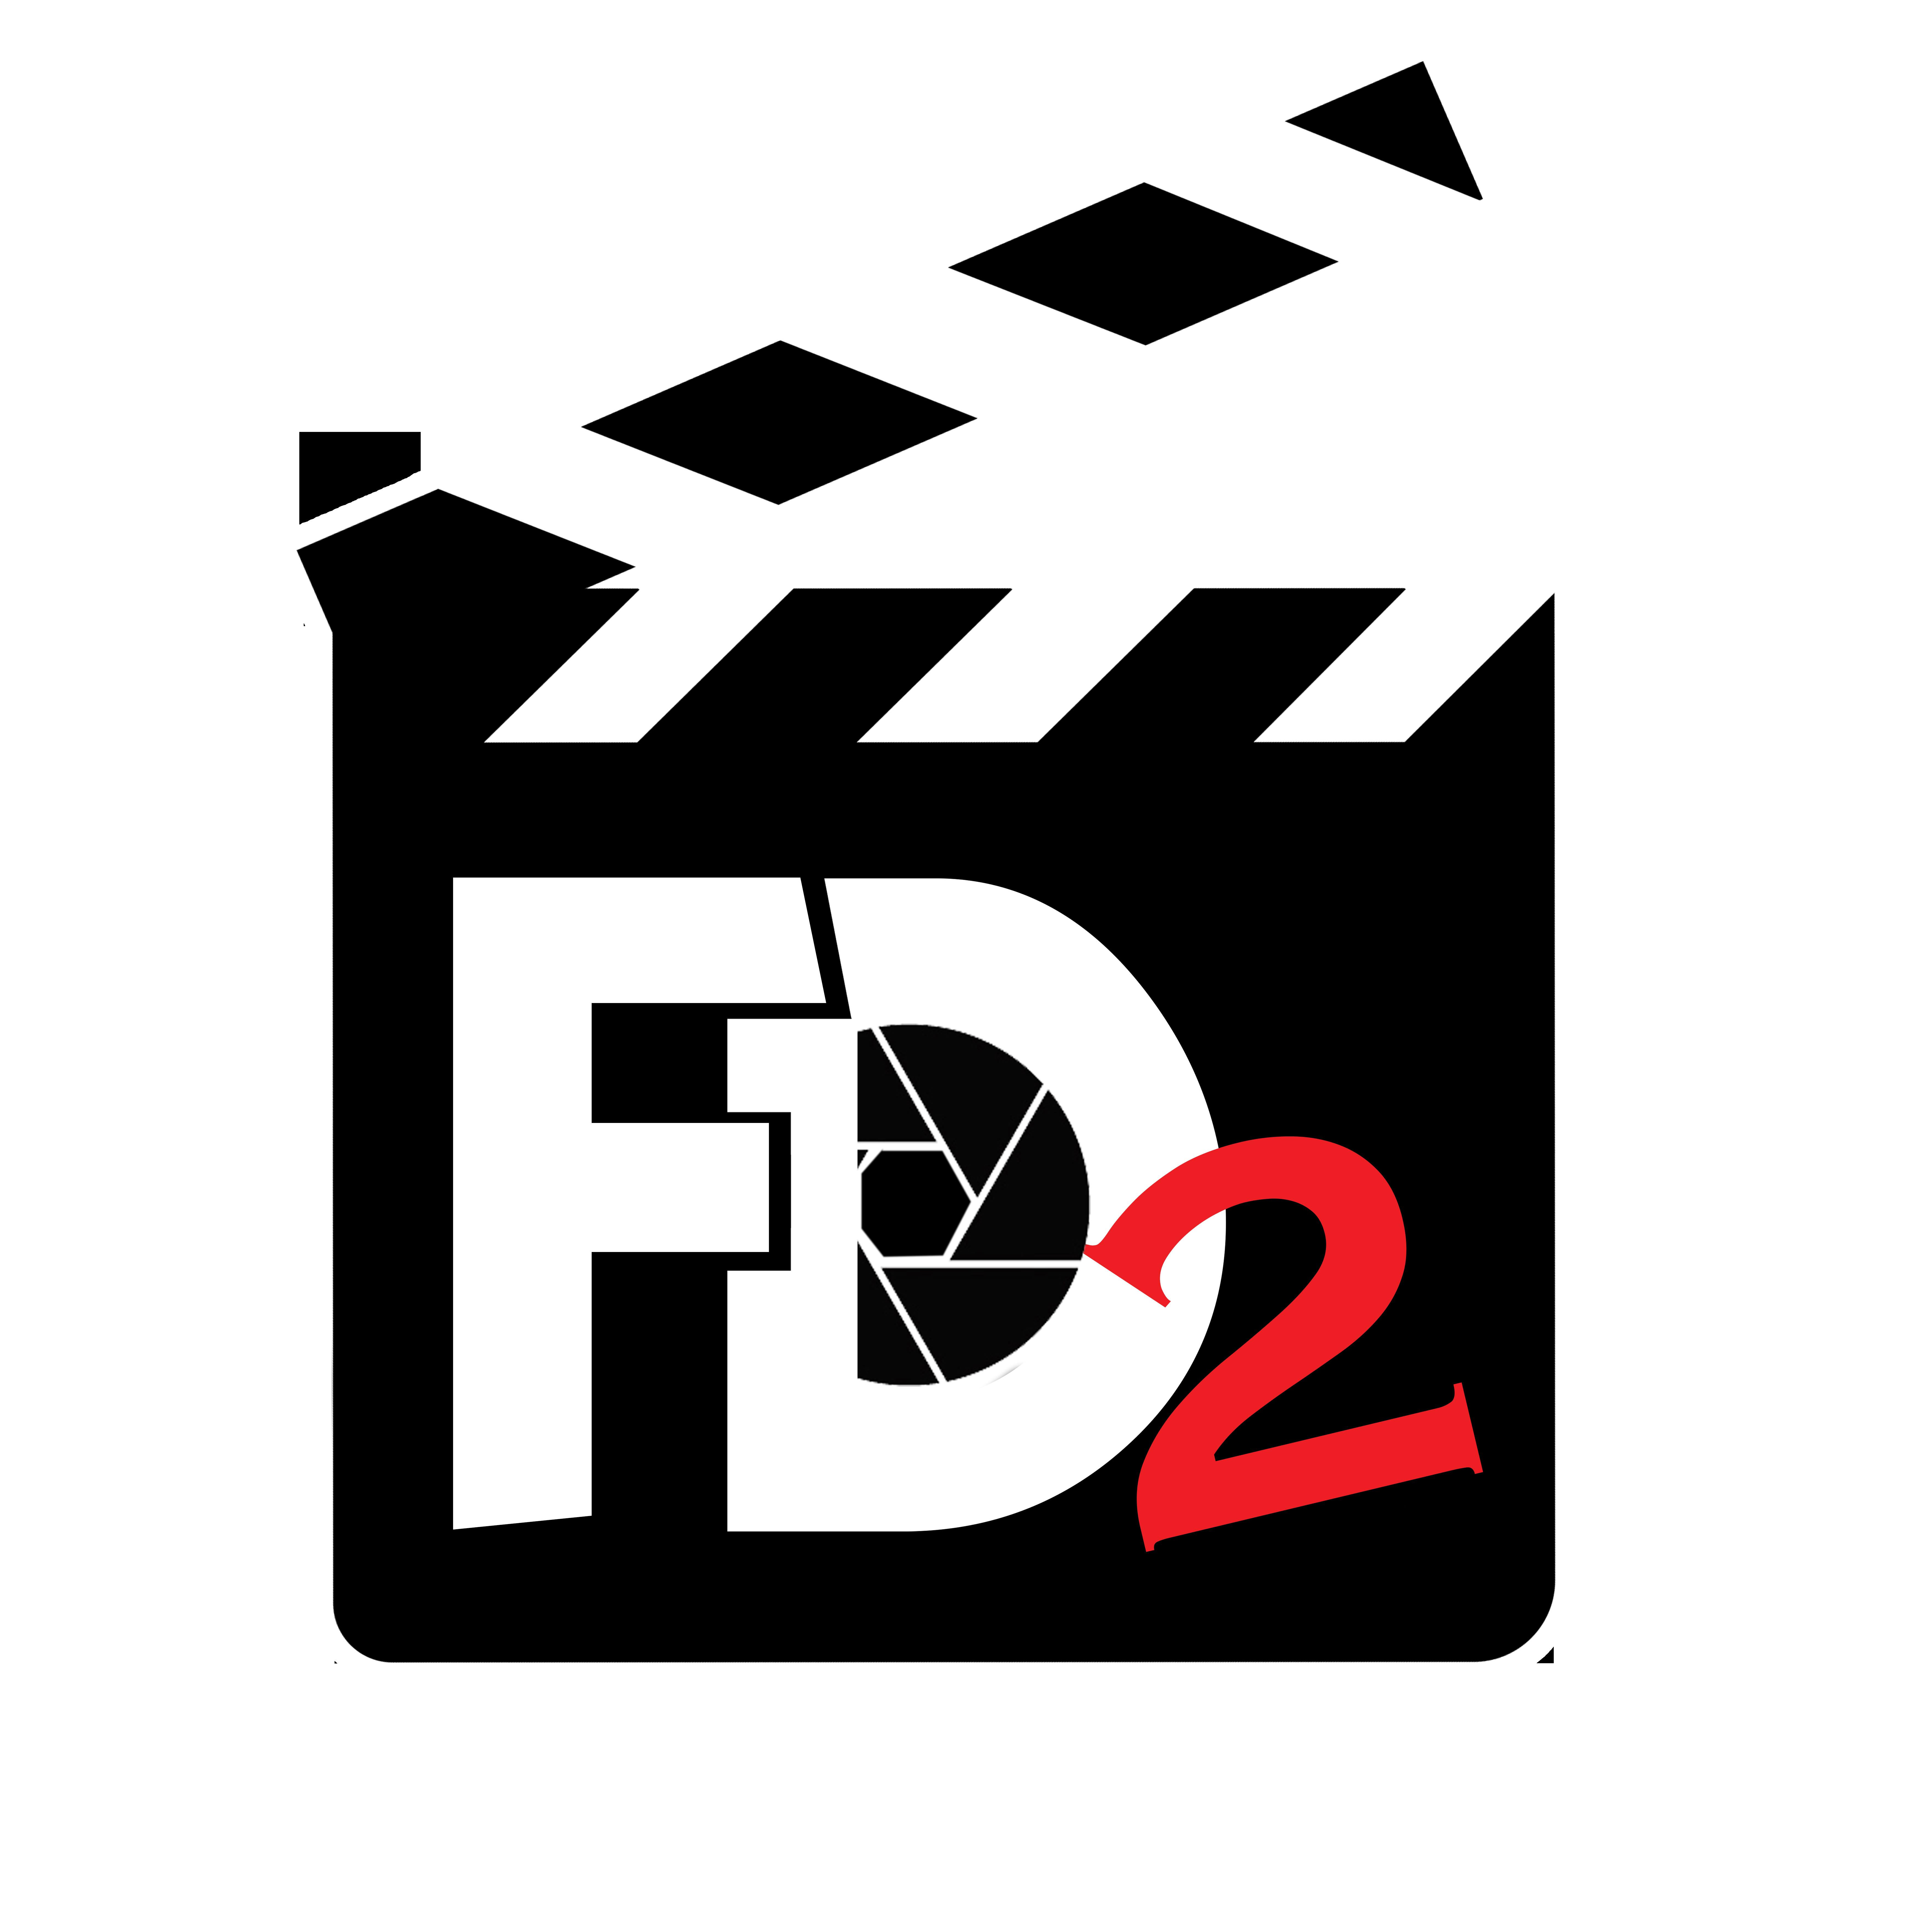 Logotipo de FD2